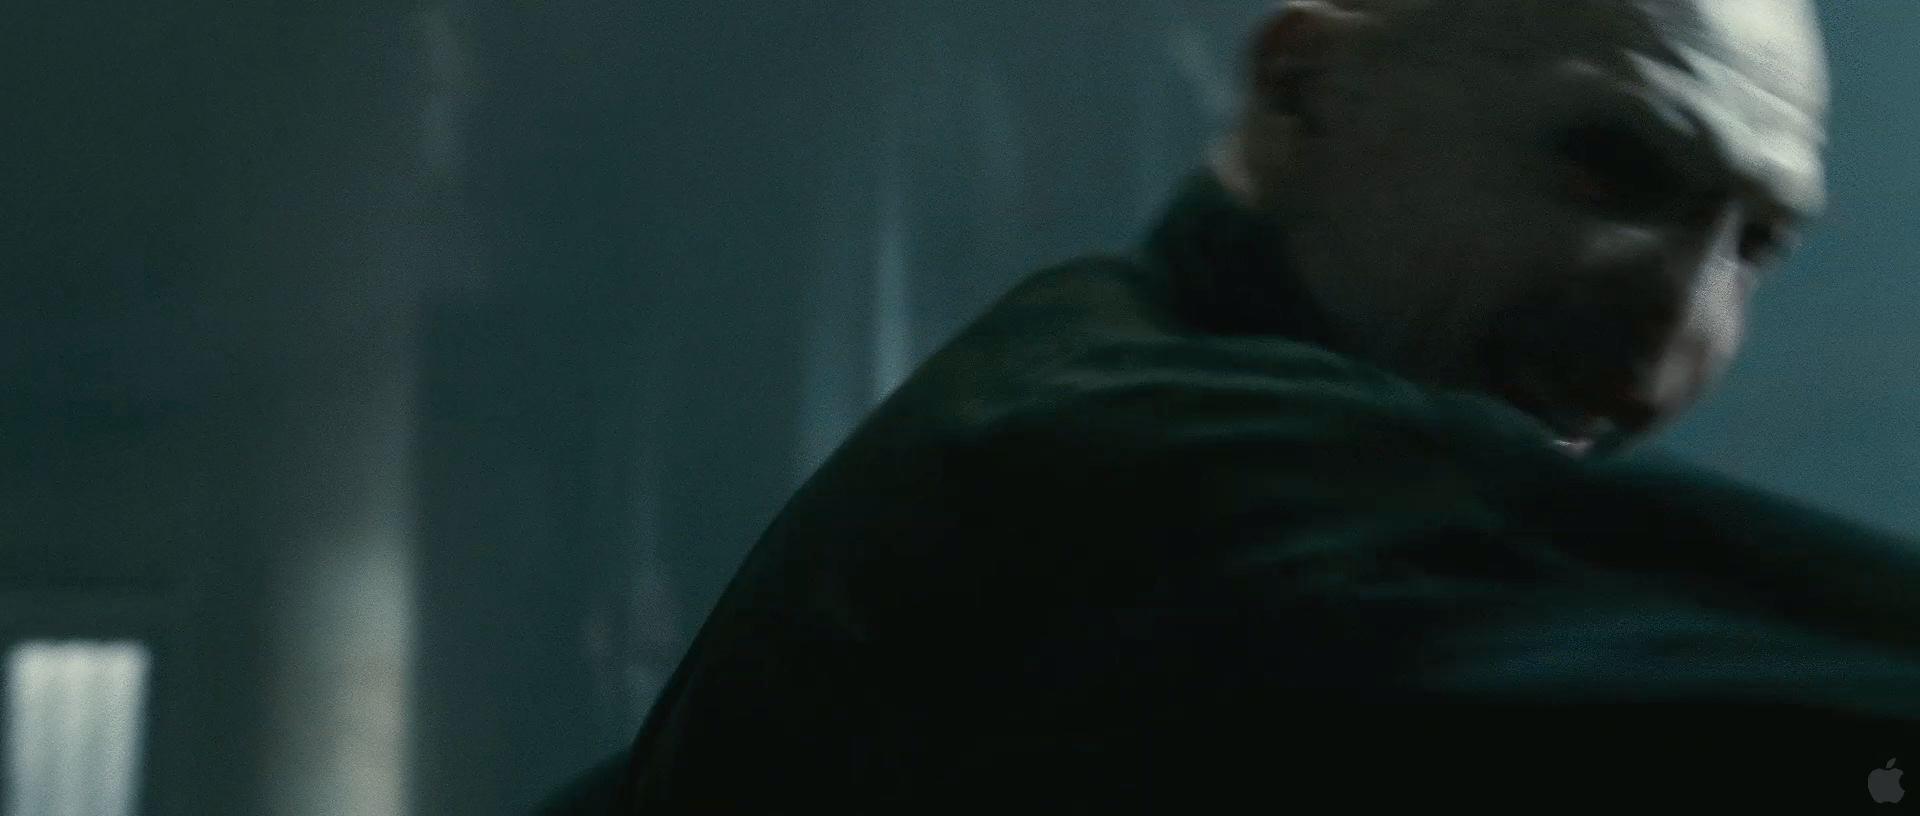 Harry Potter BlogHogwarts HP7 2 Trailer 09